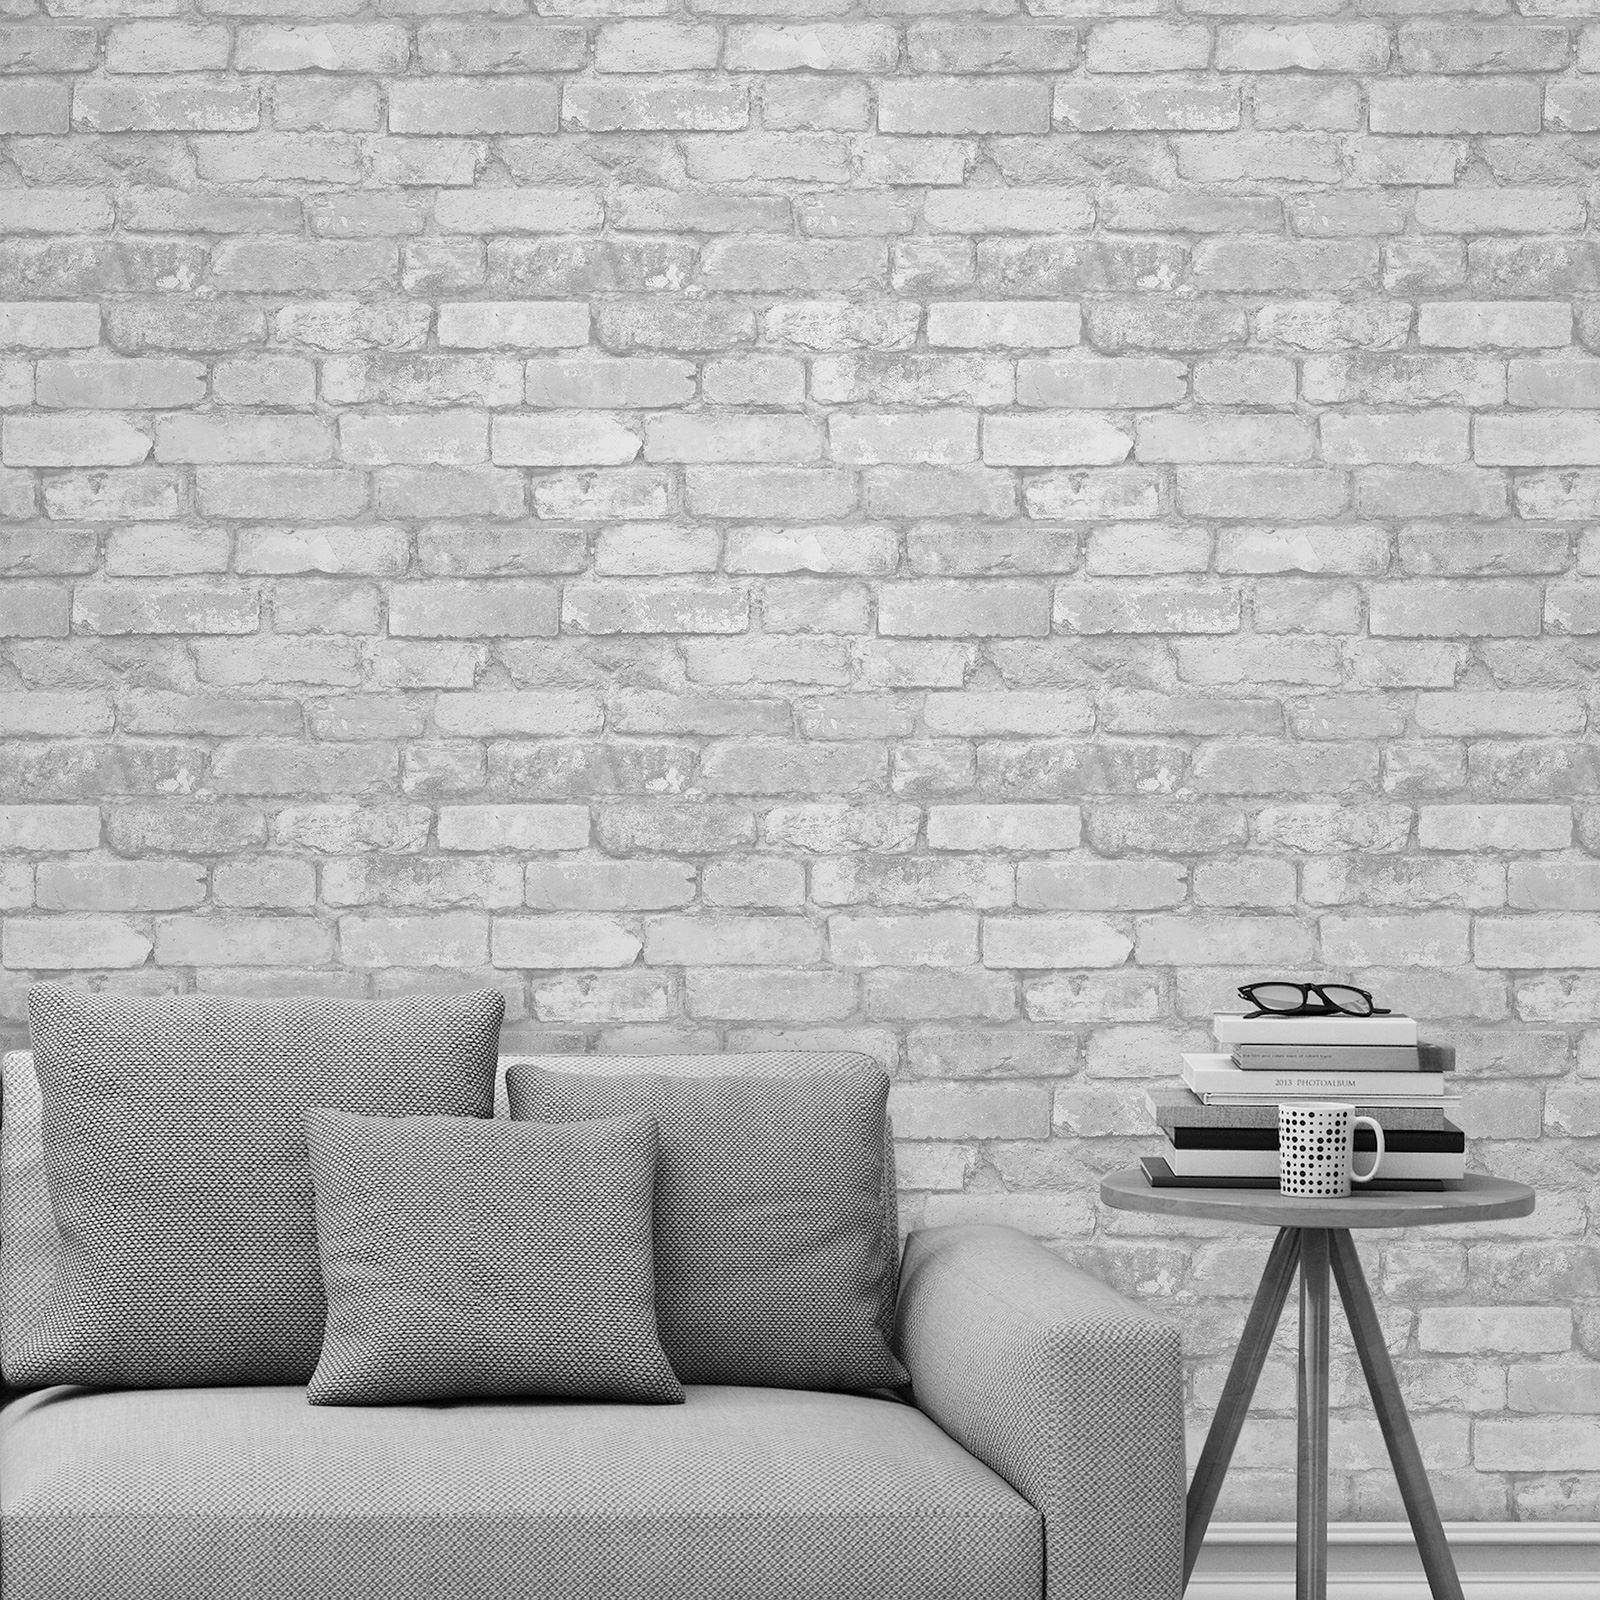 Rasch Brick Effect Wallpaper Grey Black Red Thumbnail - Pared De Ladrillo Pintada - HD Wallpaper